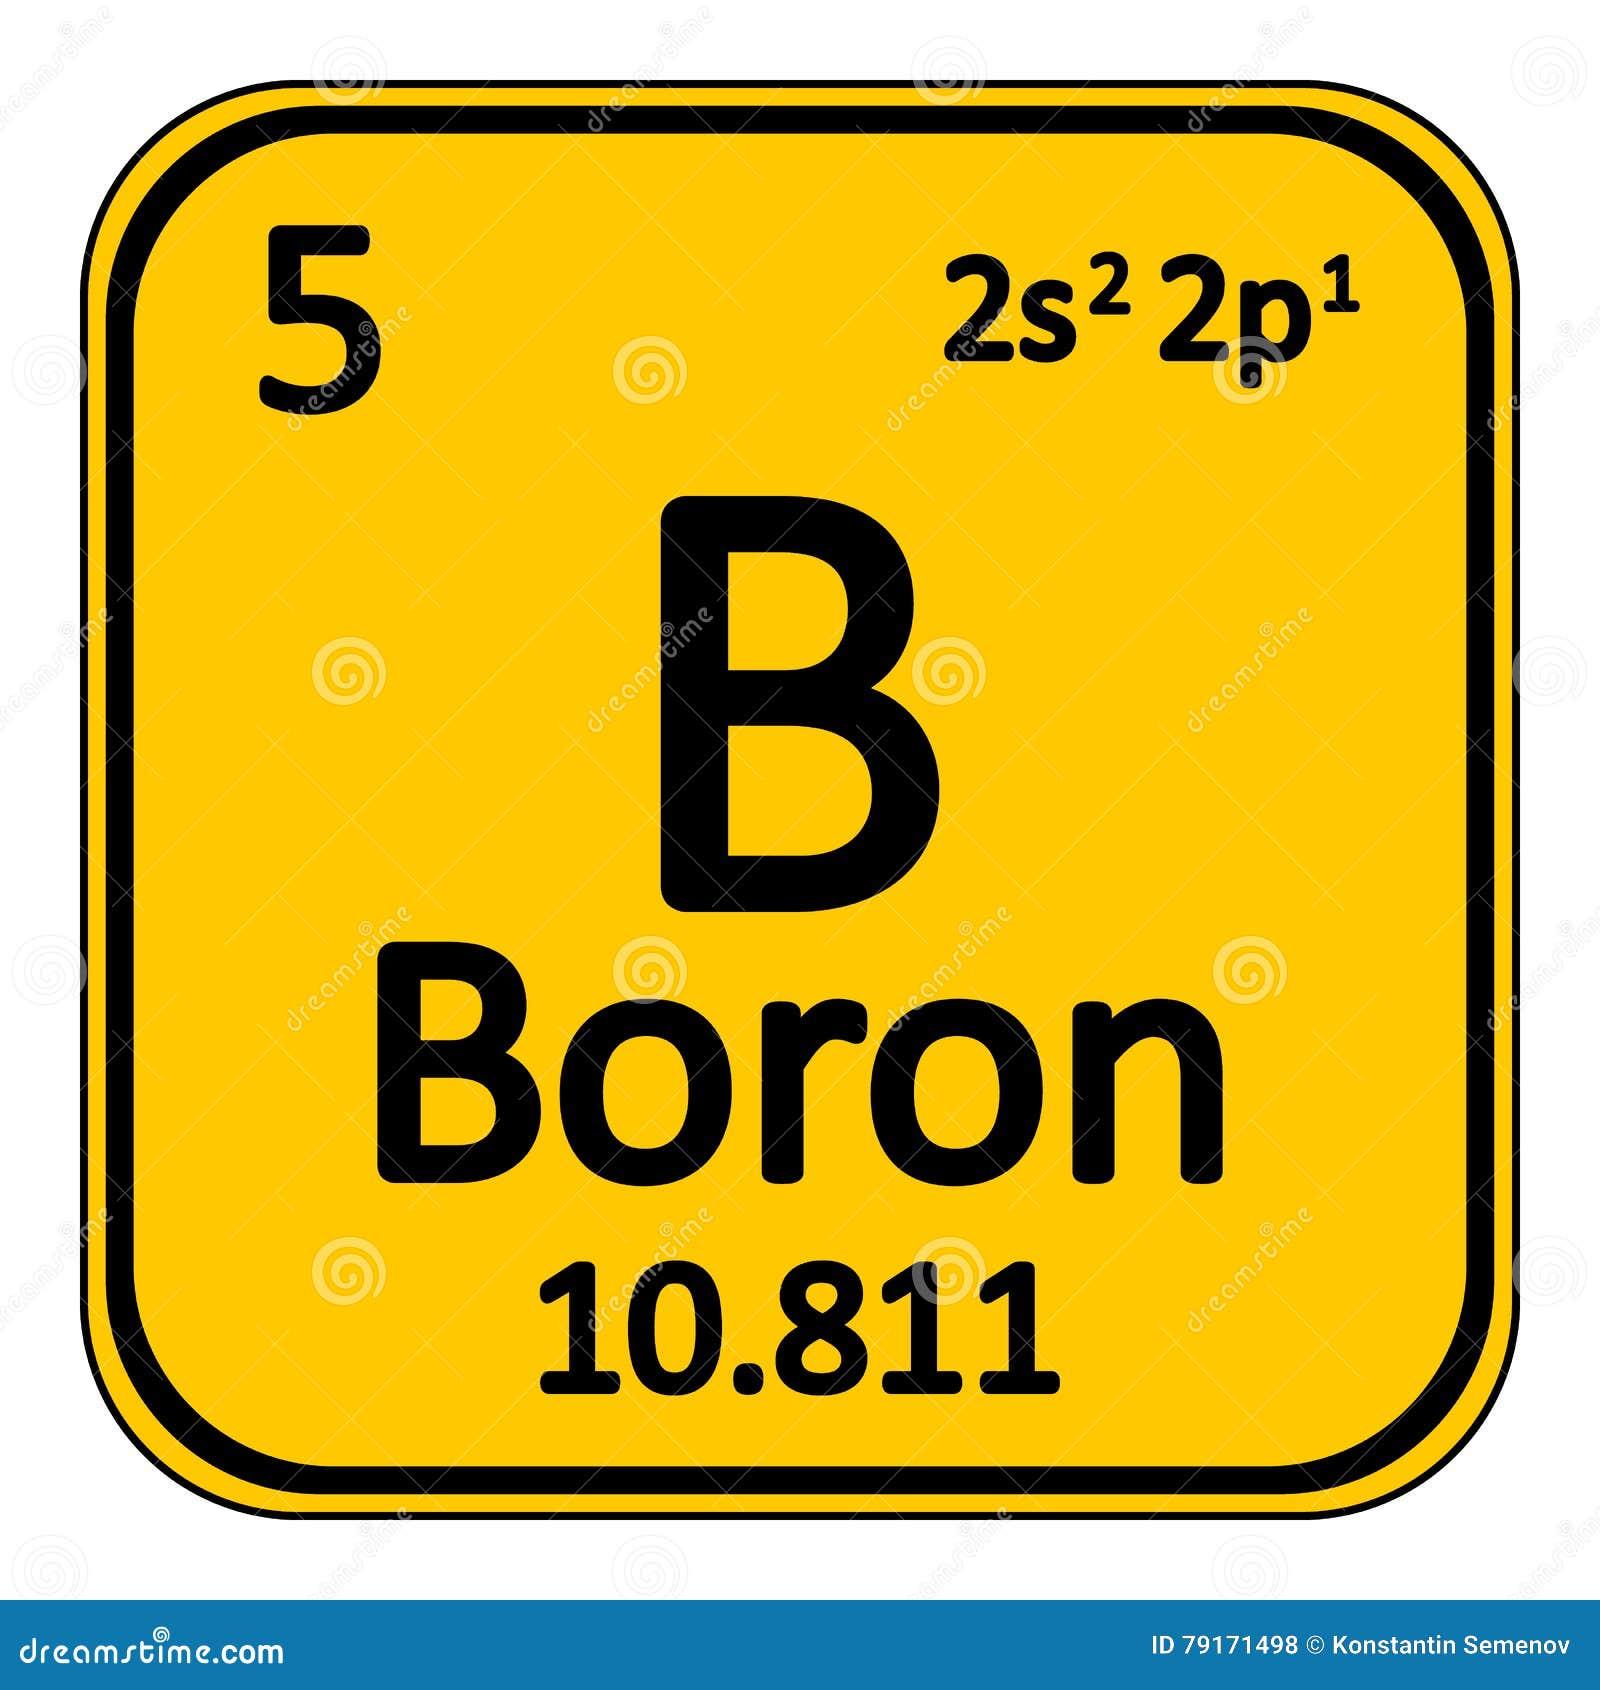 Periodic table element boron icon stock illustration image periodic table element boron icon gamestrikefo Image collections